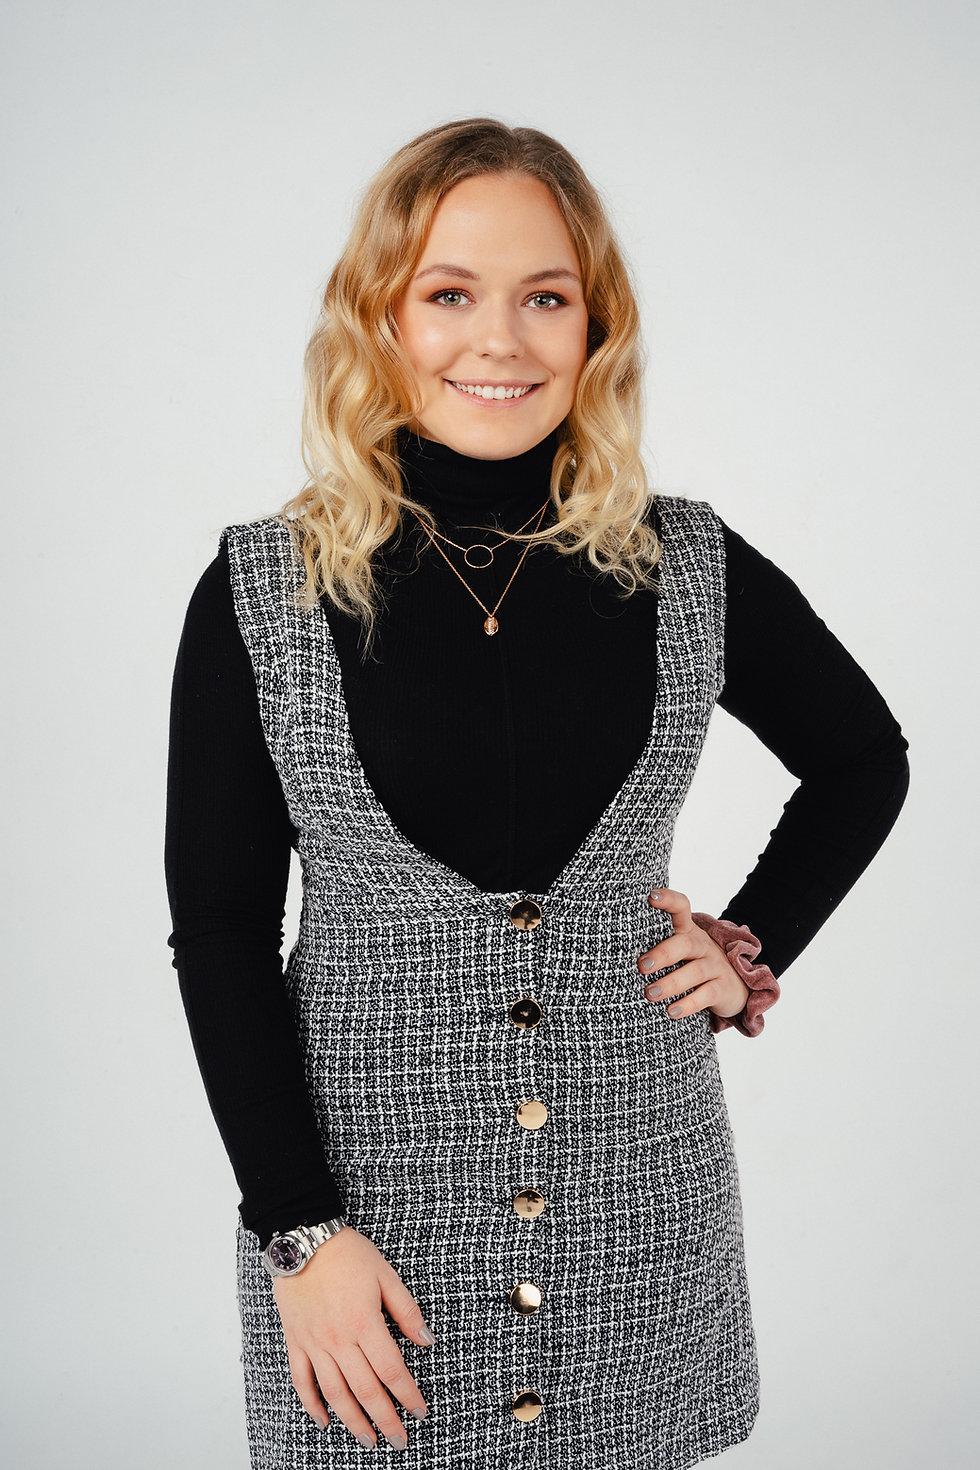 Alina Obermair Business Portrait